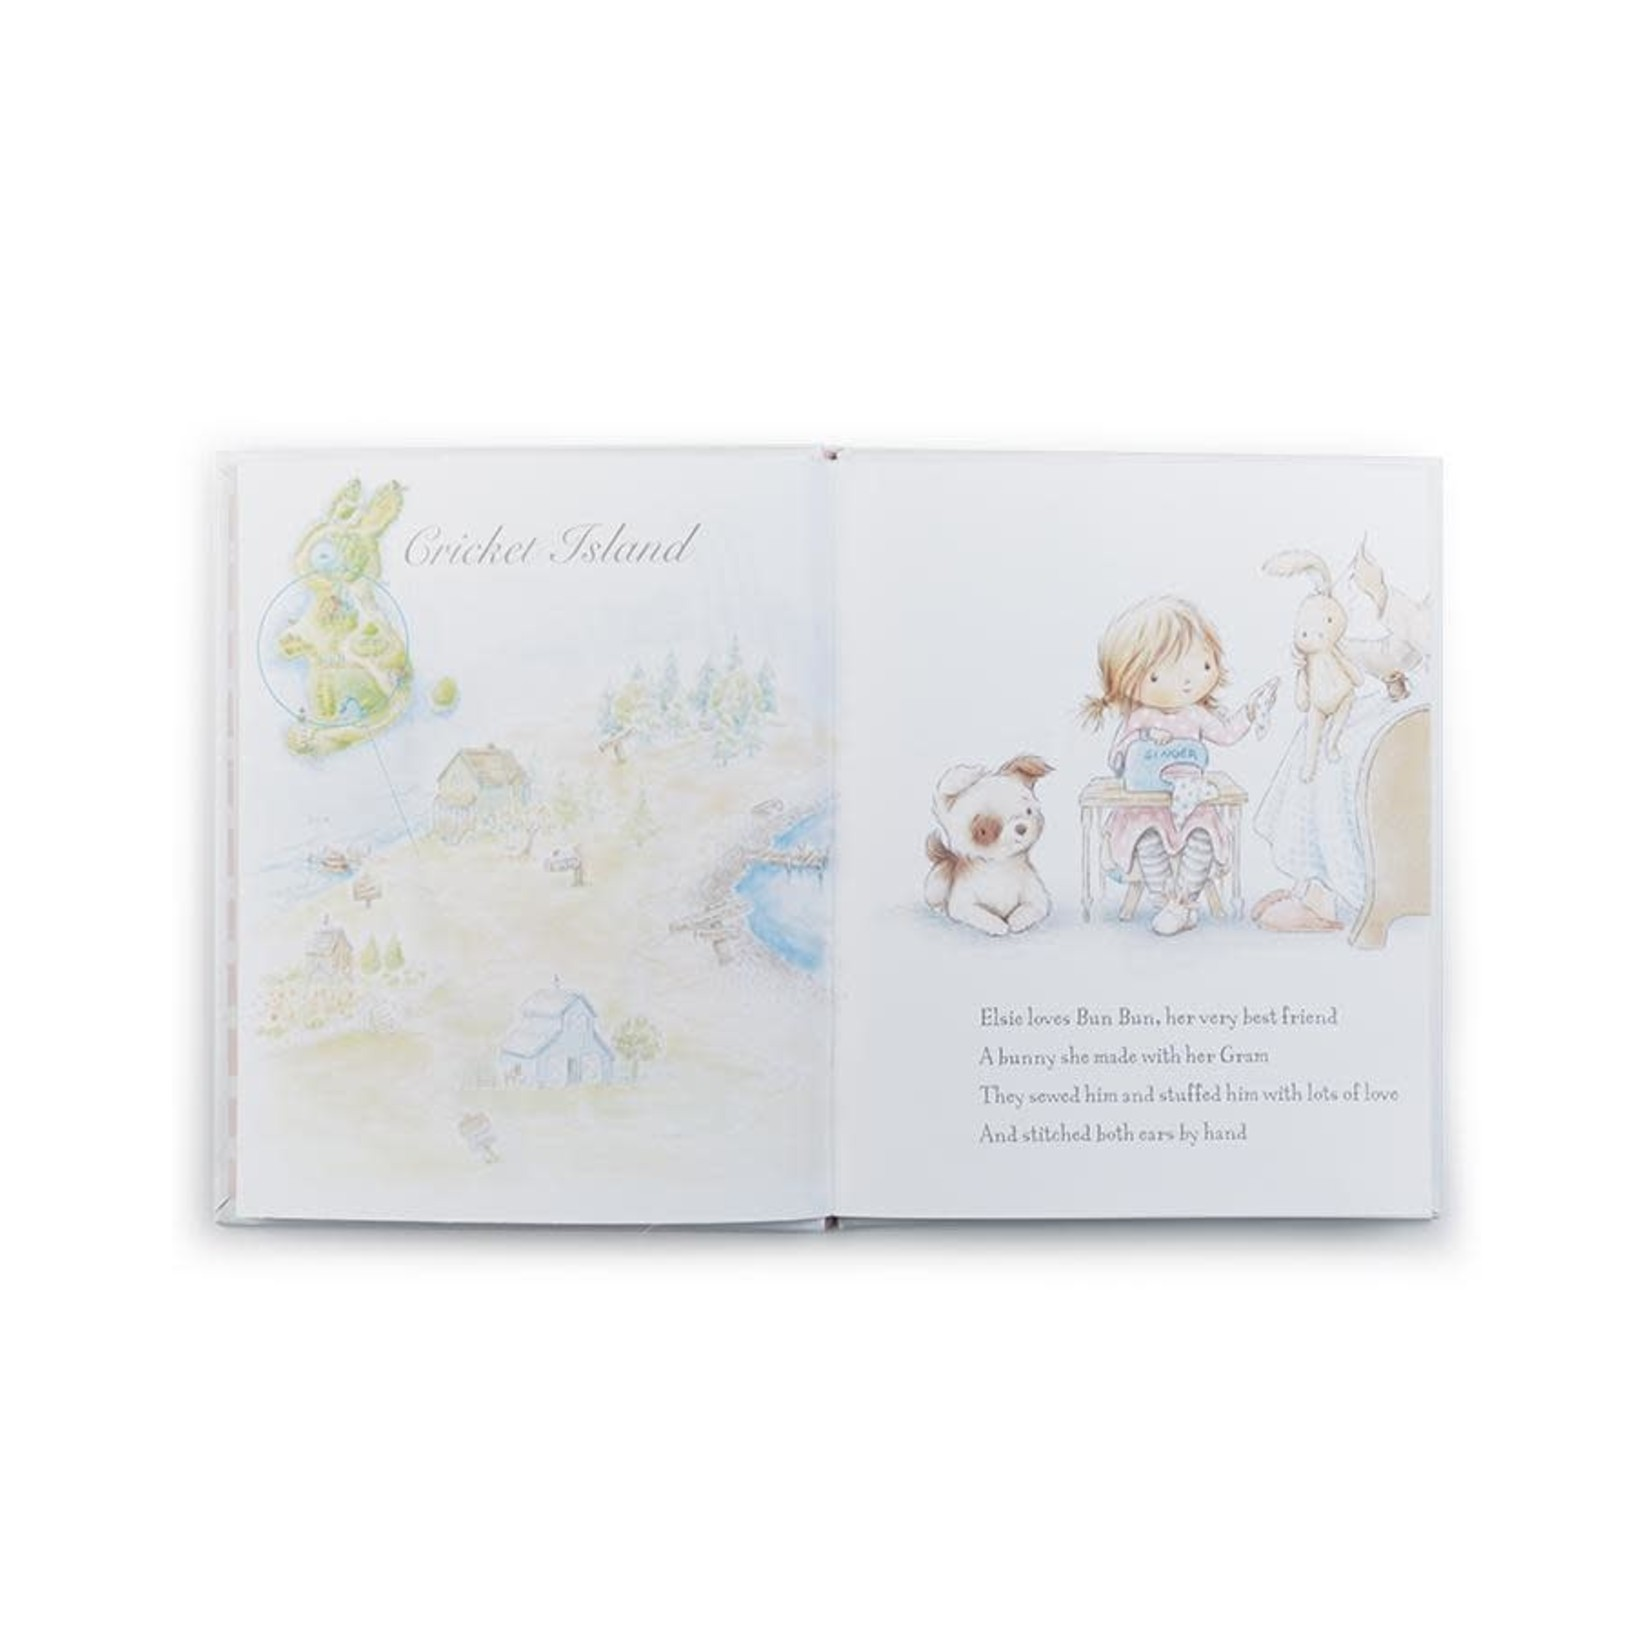 Bunnies By  Bay Bun Bun A Love Story Book